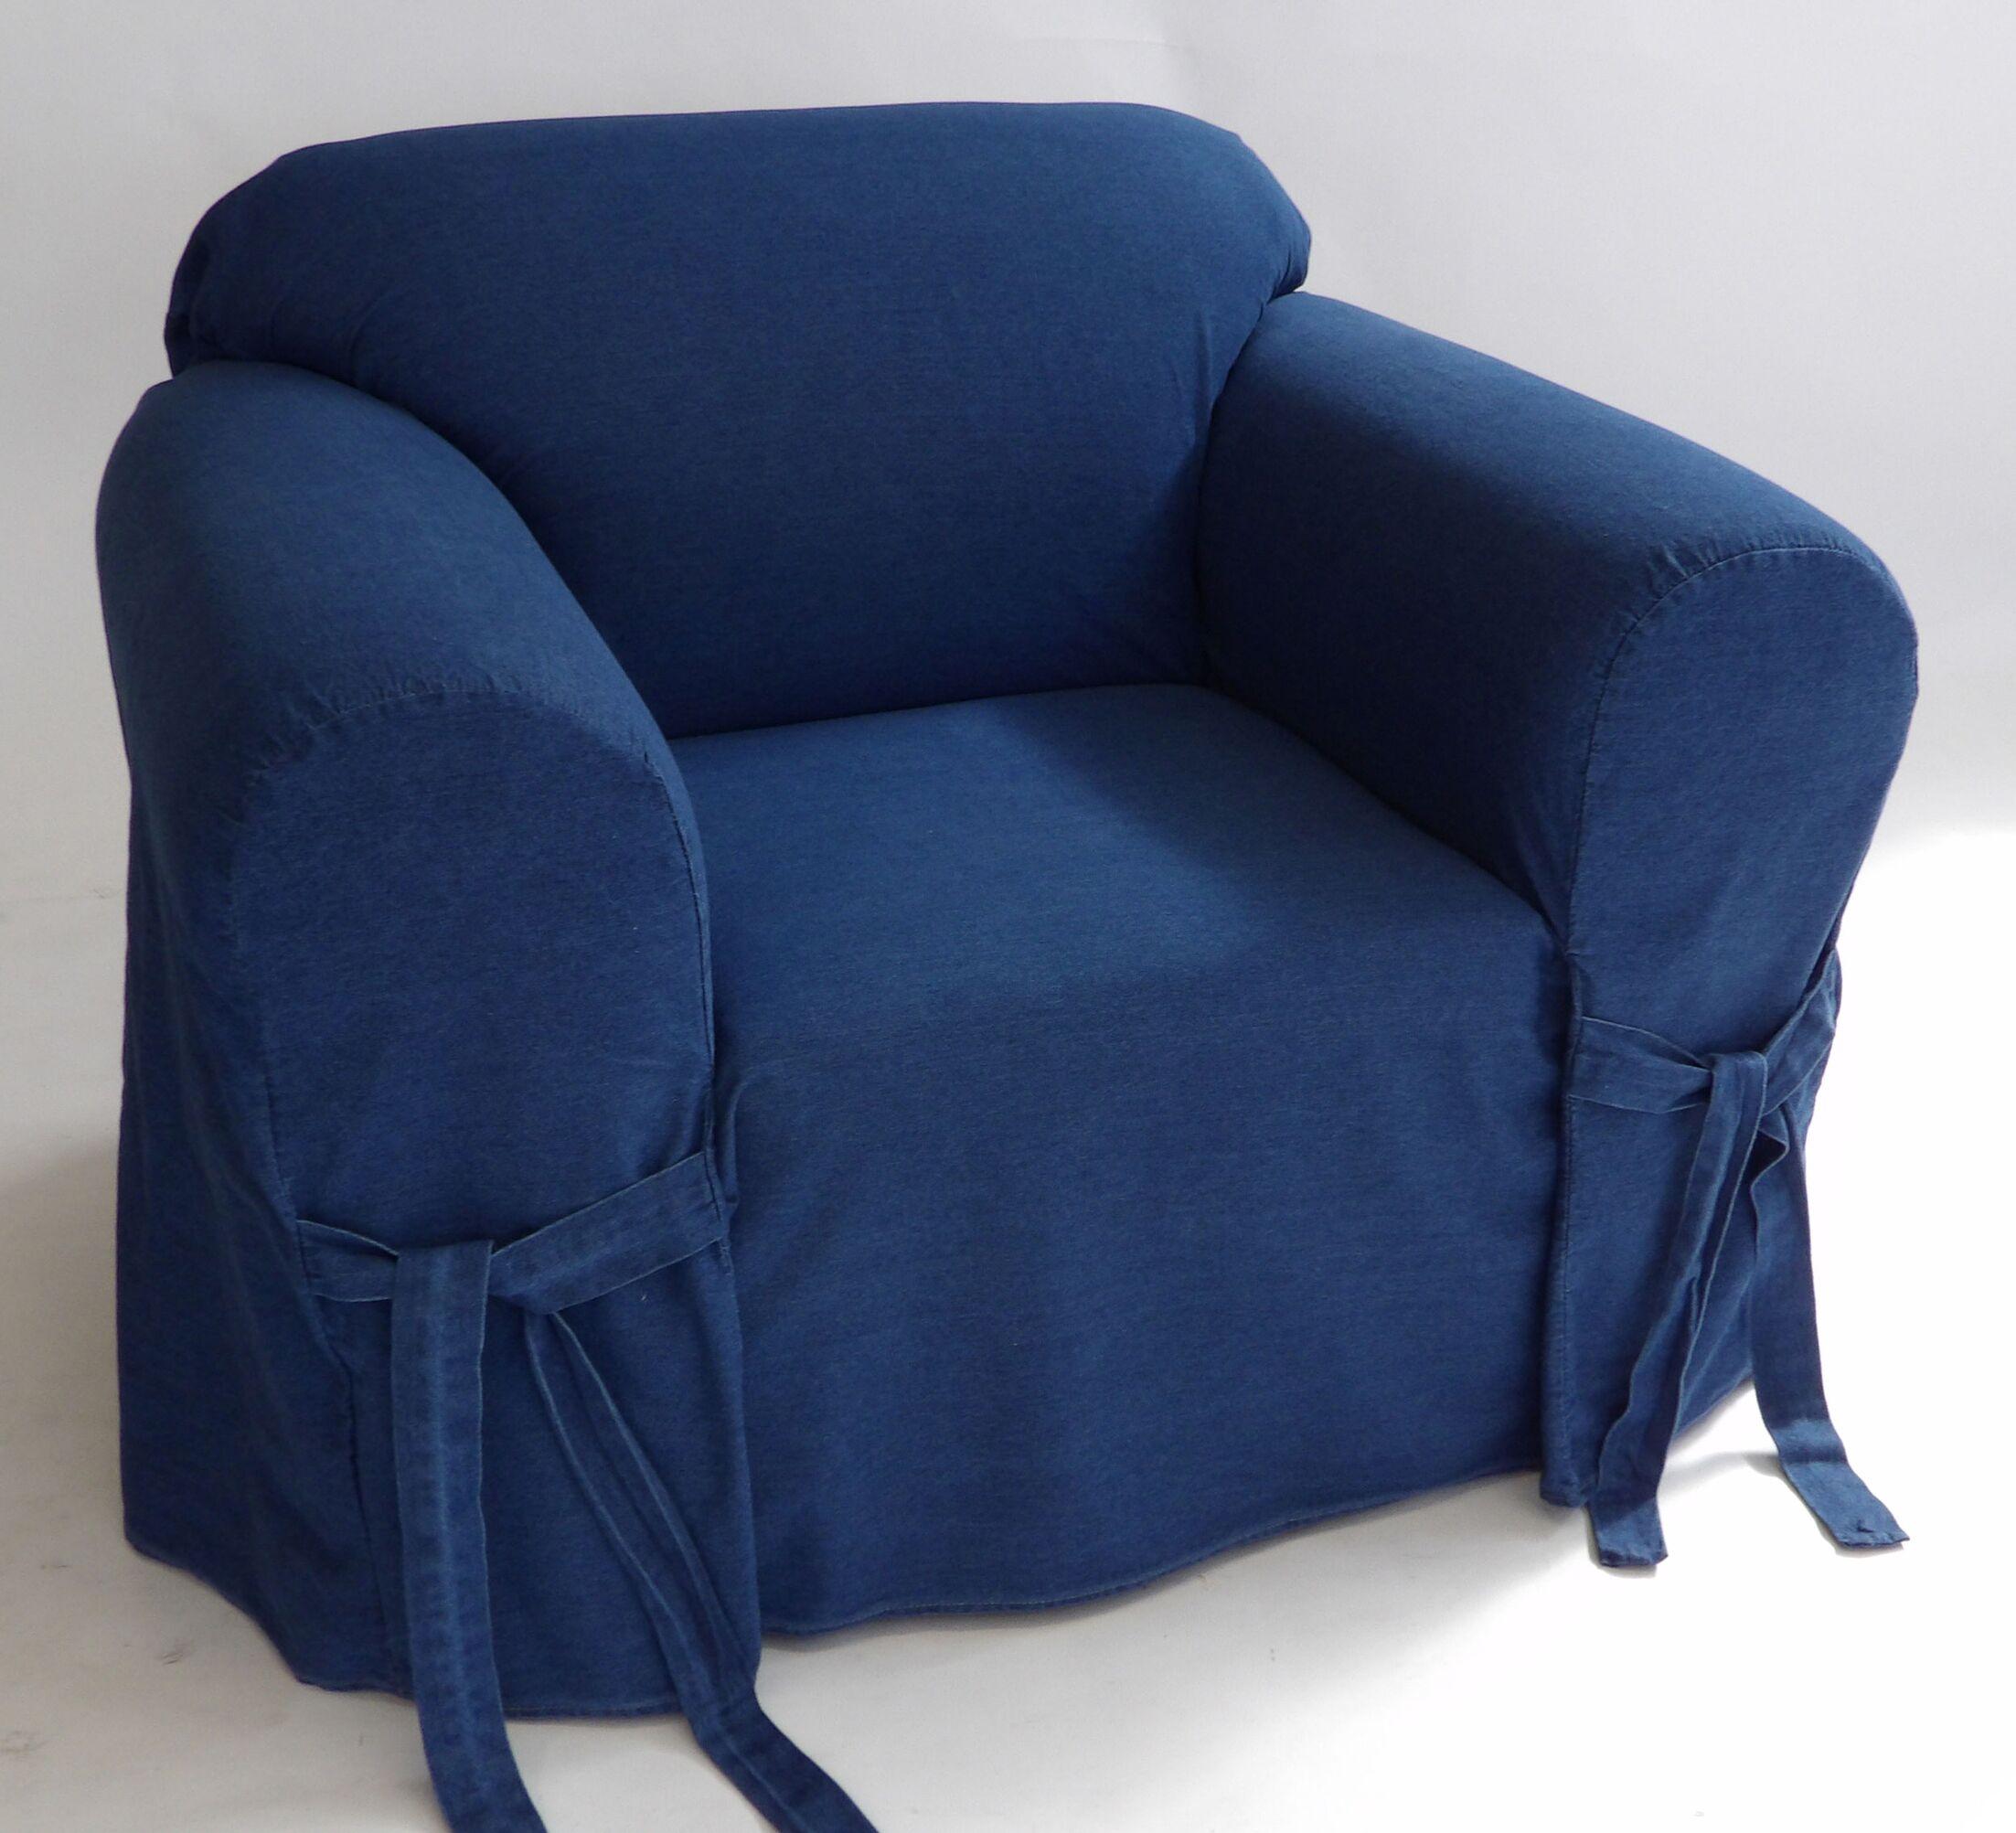 Authentic Box Cushion Armchair Slipcover